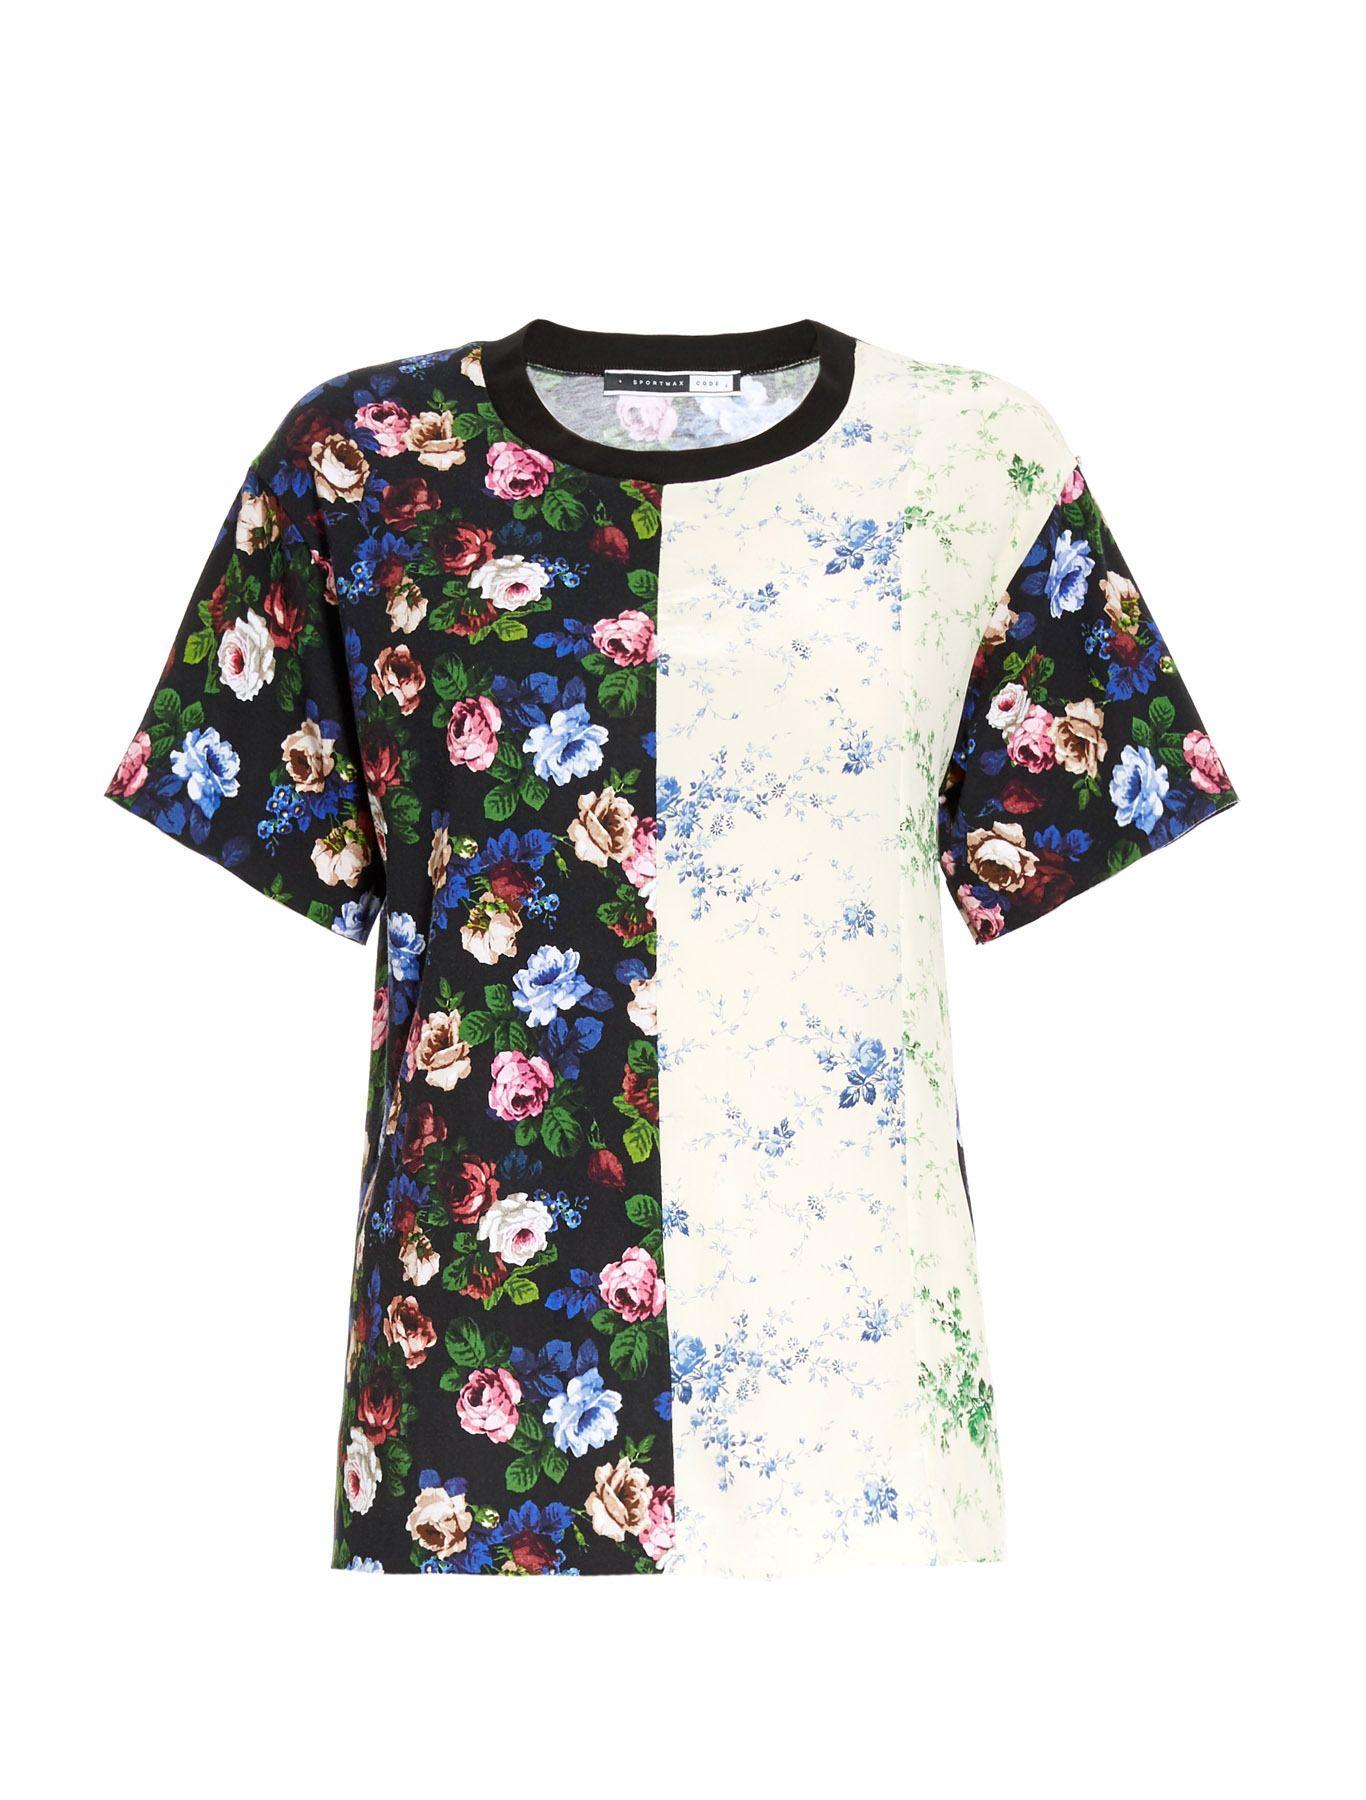 a9f4b4369705b3 Retro floral collage T-shirt